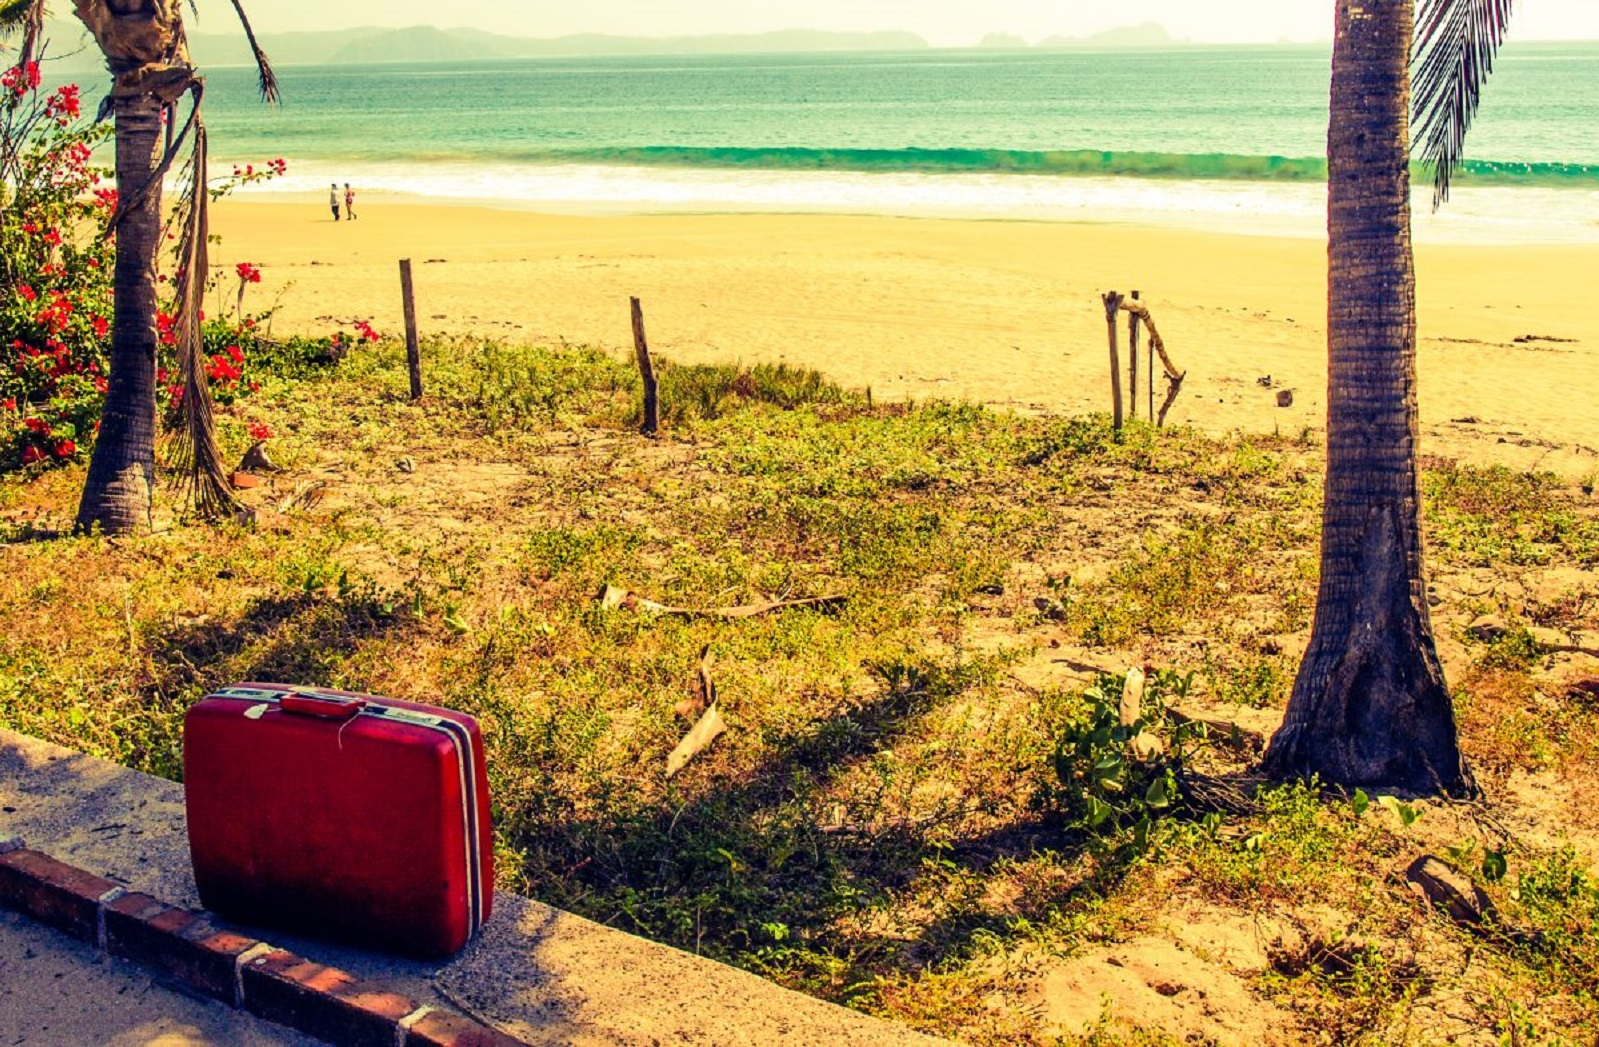 Mexico Travel — Tips for Avoiding the Tourist Trail